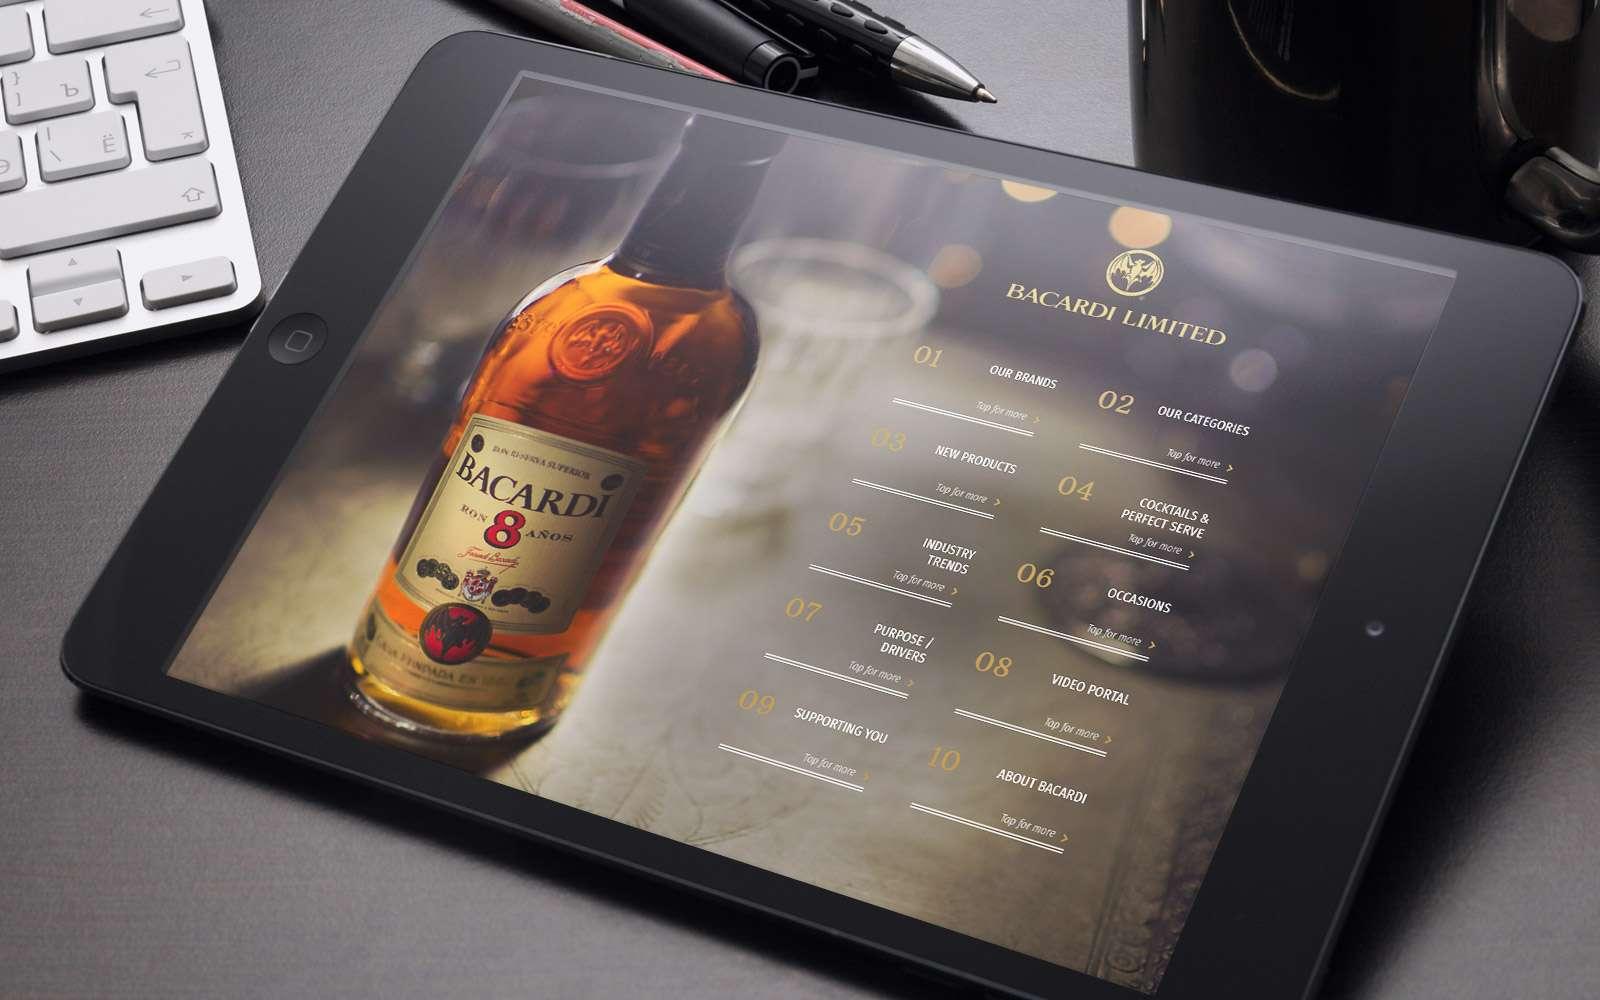 Barcadi interactive sales enable tool displayed on iPad